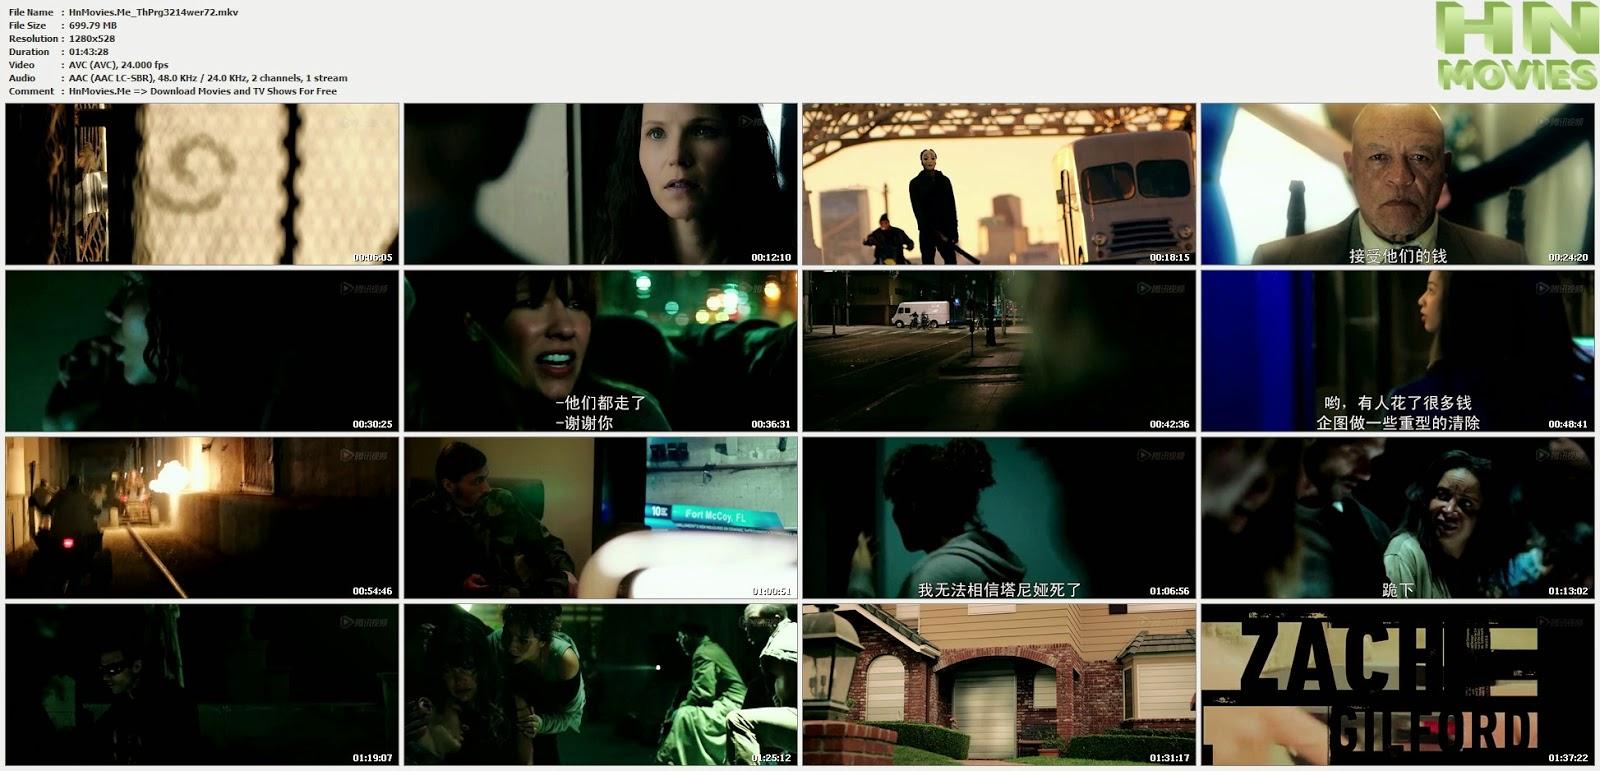 movie screenshot of The Purge: Anarchy fdmovie.com